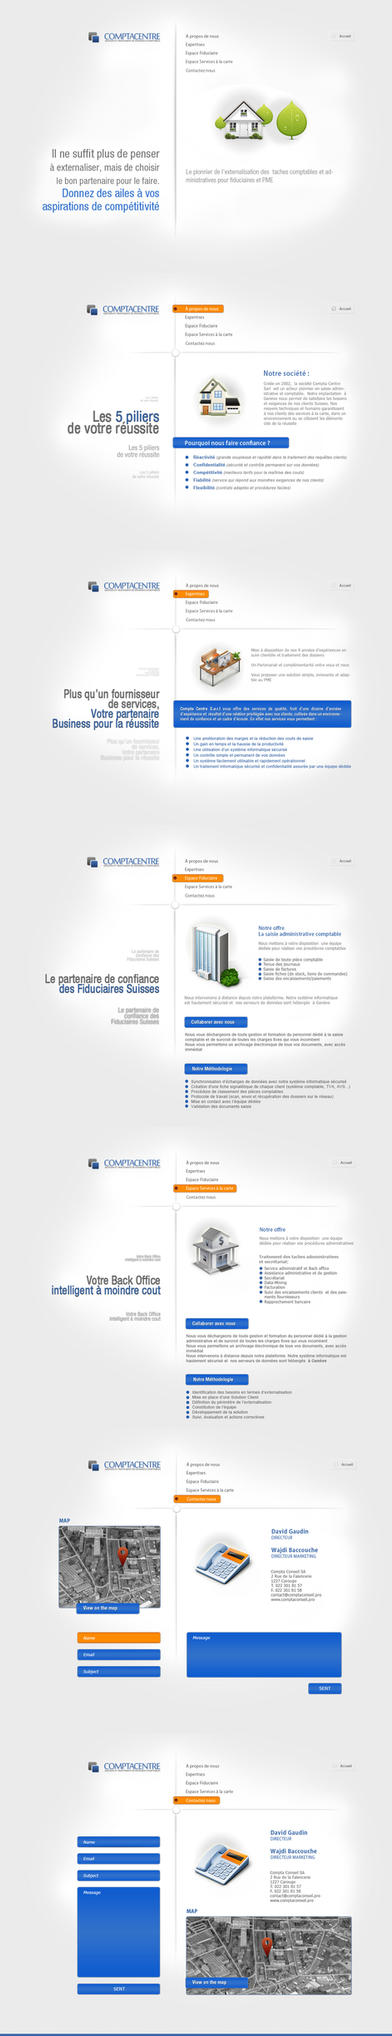 ComptaCenter Web Design by magneticlab